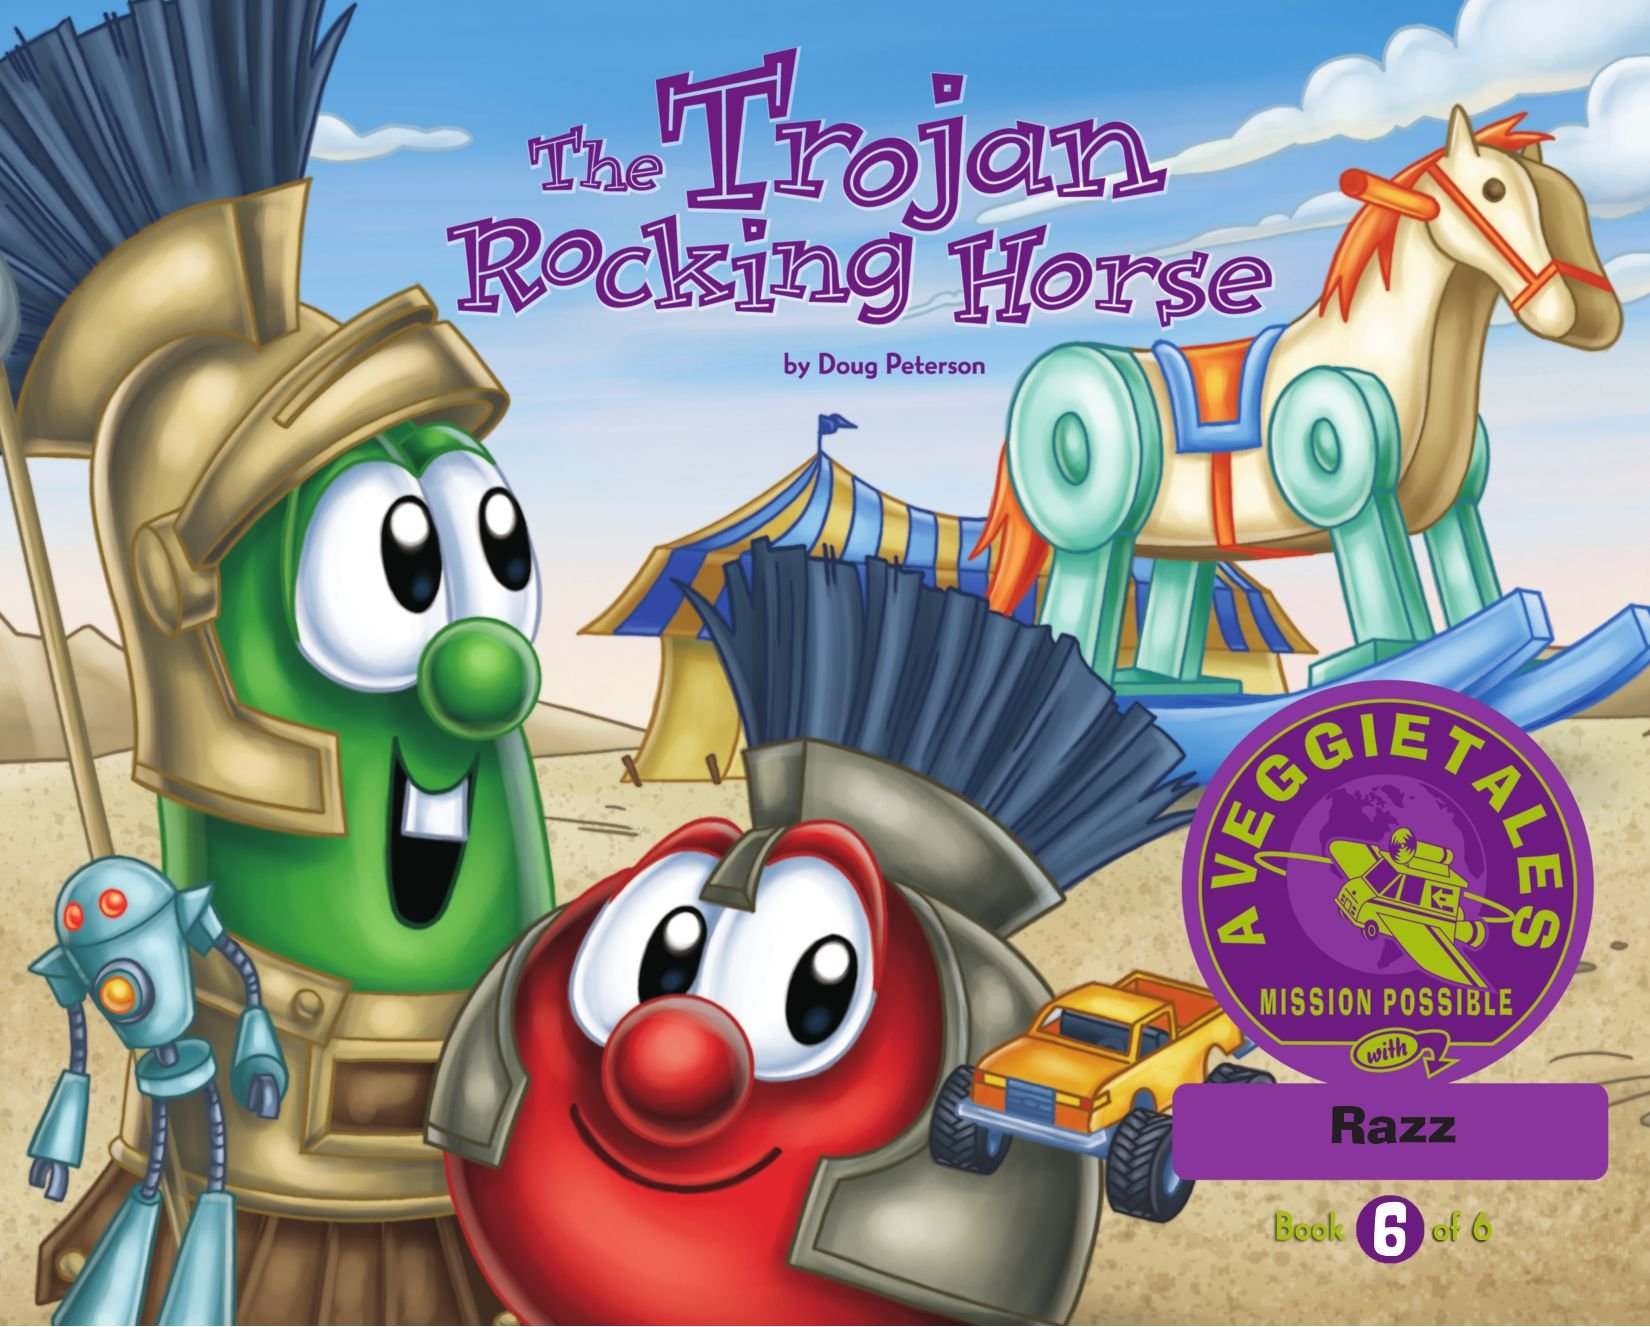 The Trojan Rocking Horse - VeggieTales Mission Possible Adventure Series #6: Personalized for Razz (Girl) pdf